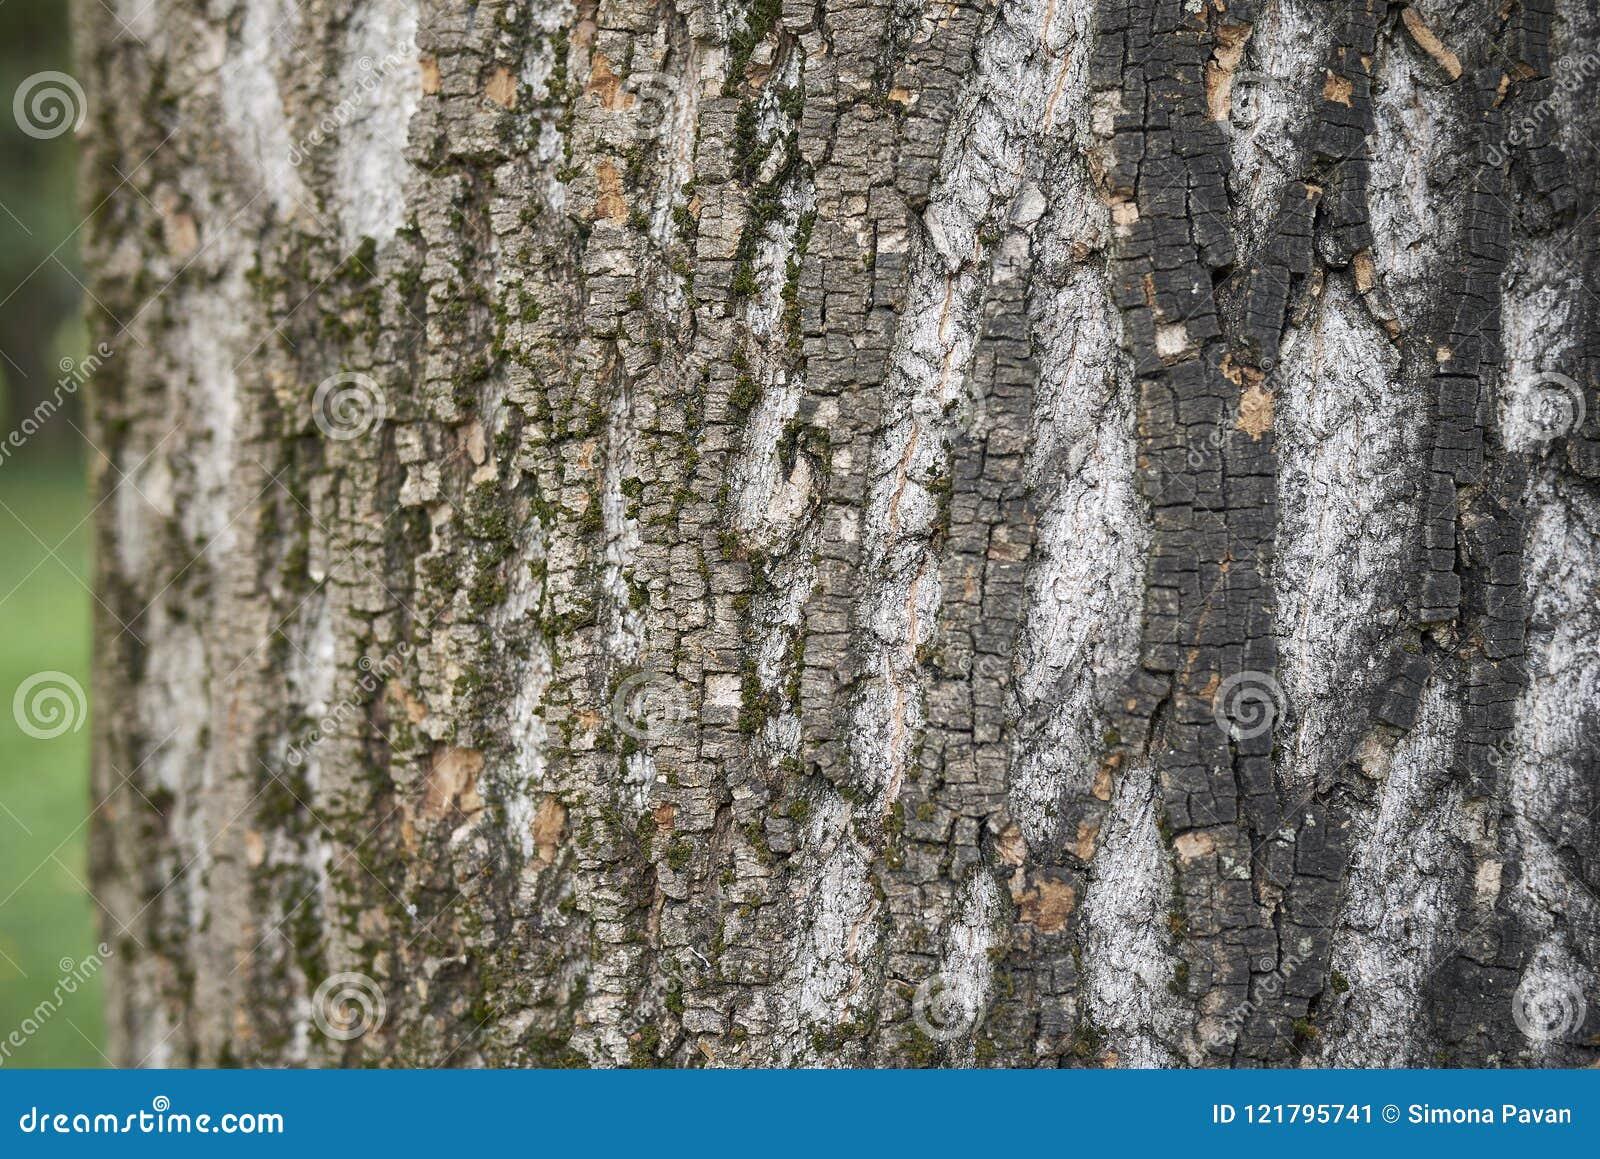 Acer Saccharinum Trunk Stock Image Image Of Background 121795741